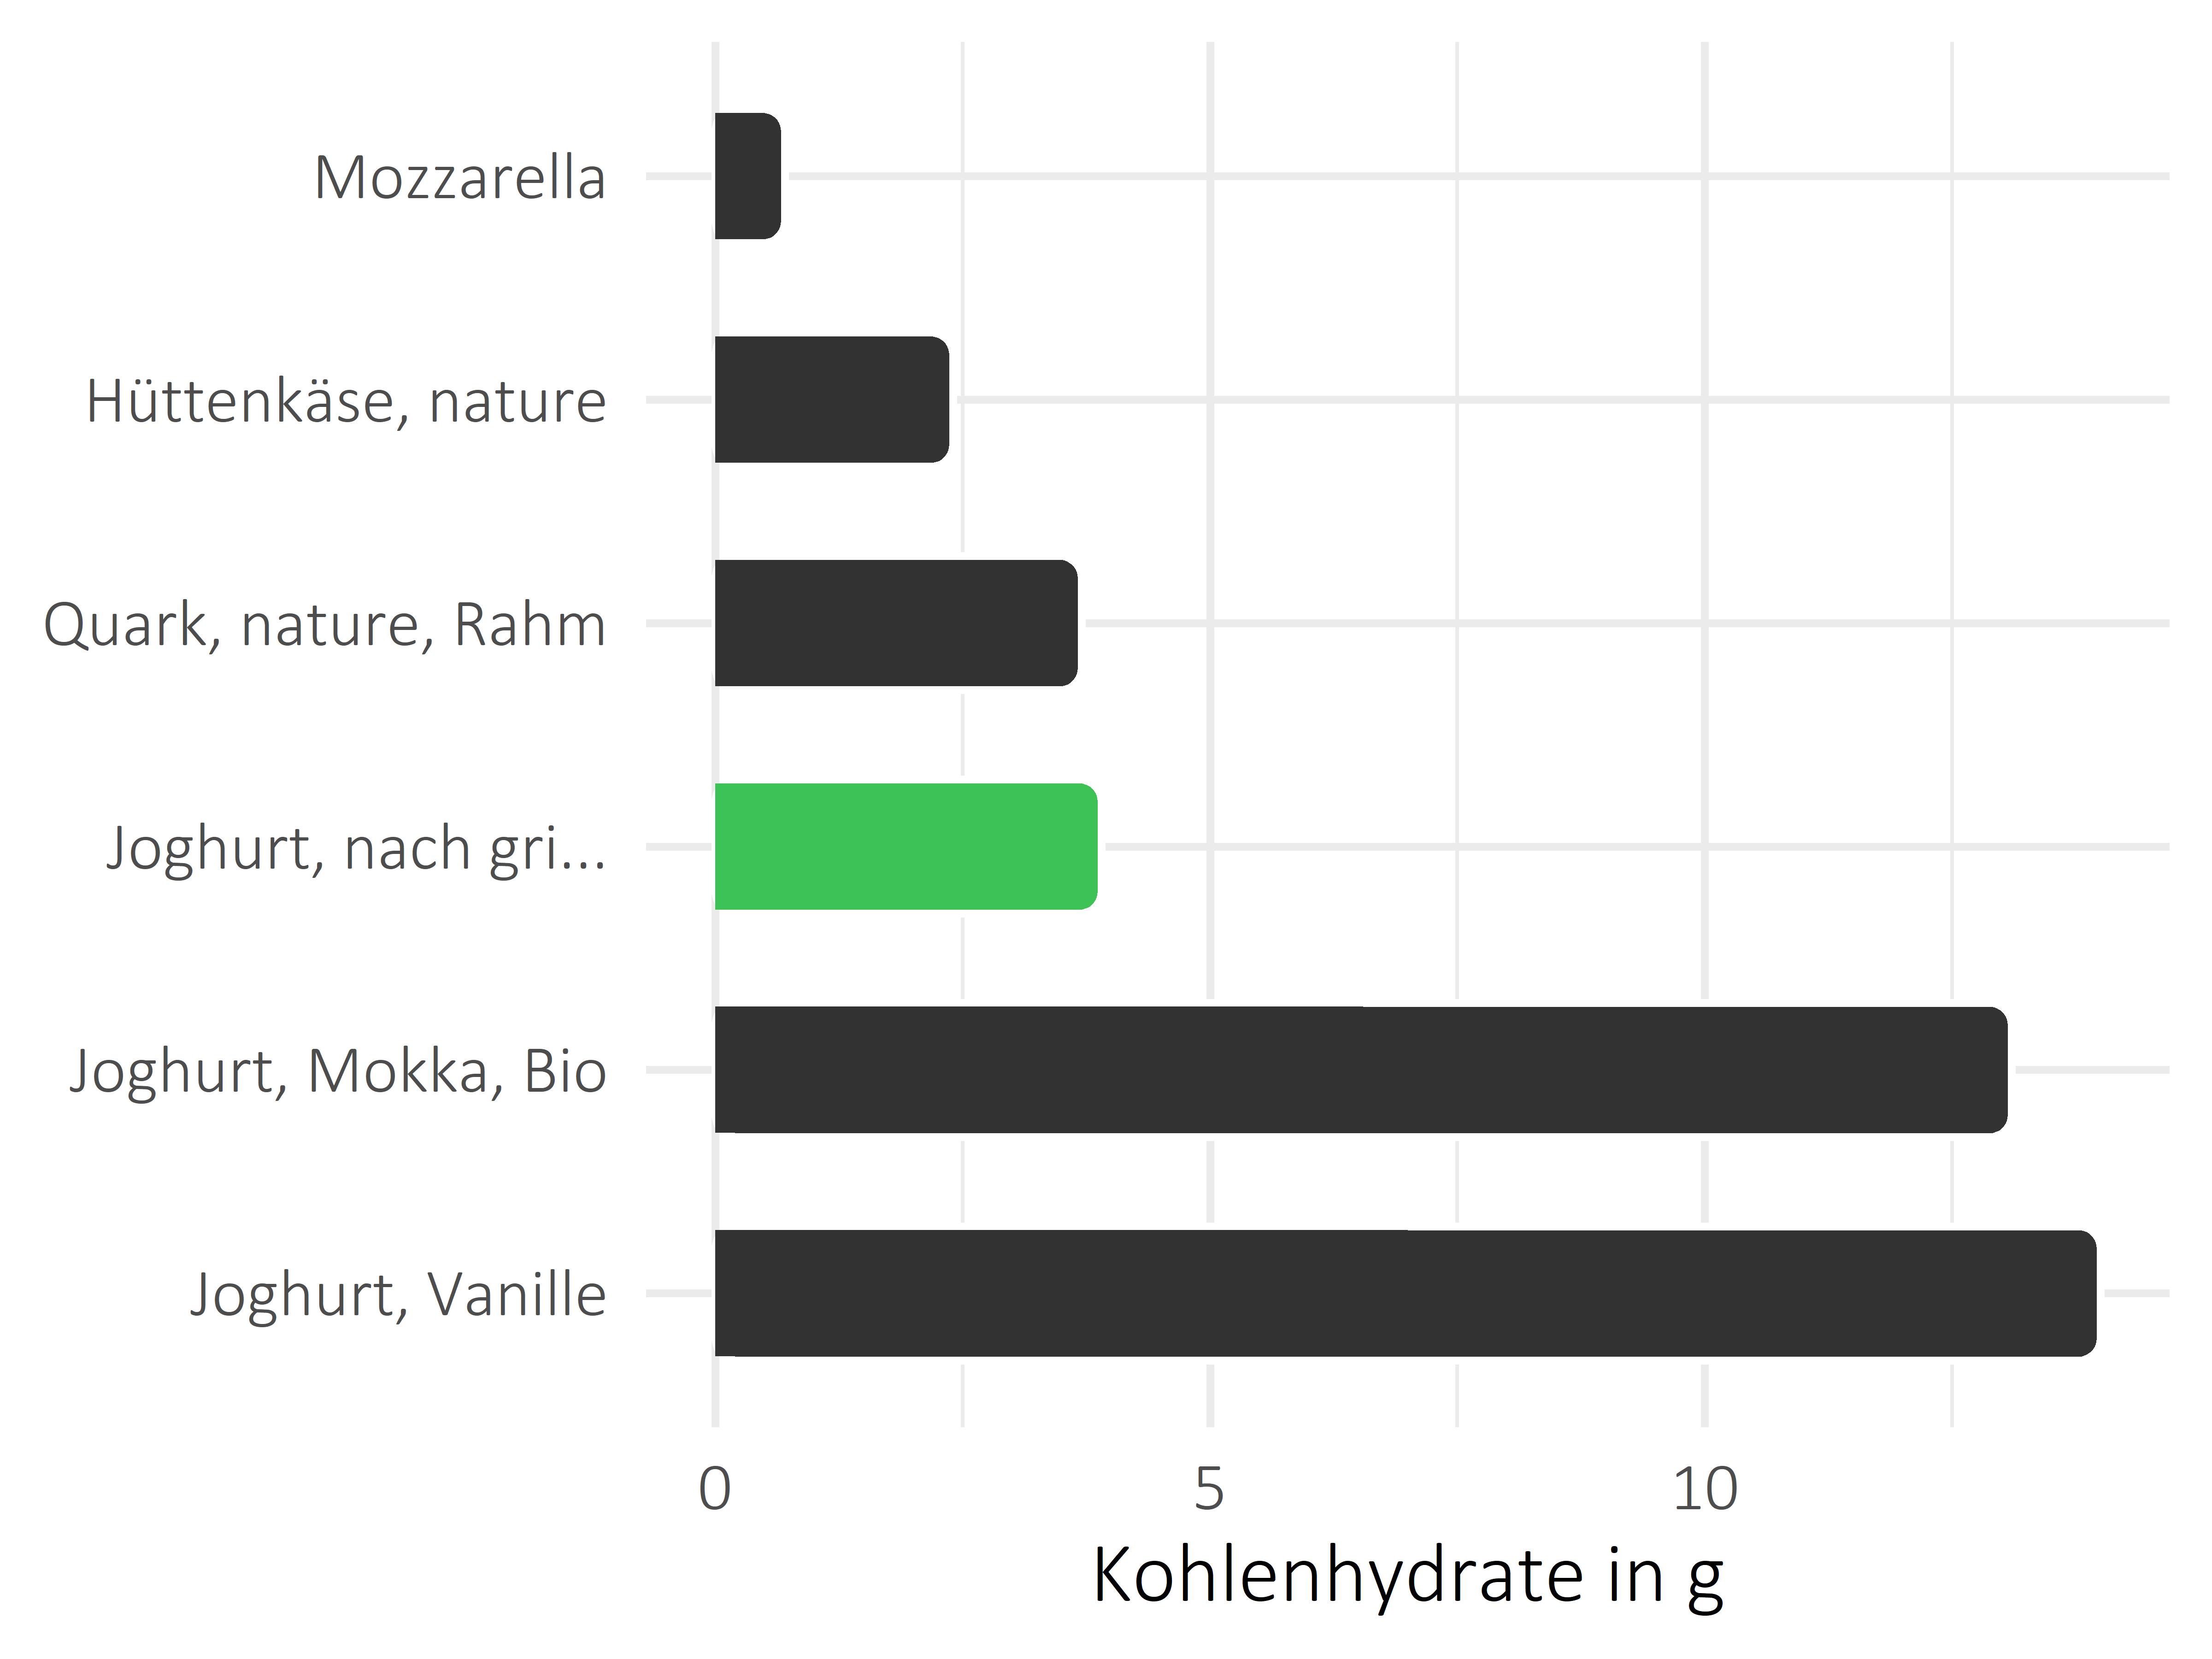 Milchprodukte Kohlenhydrate